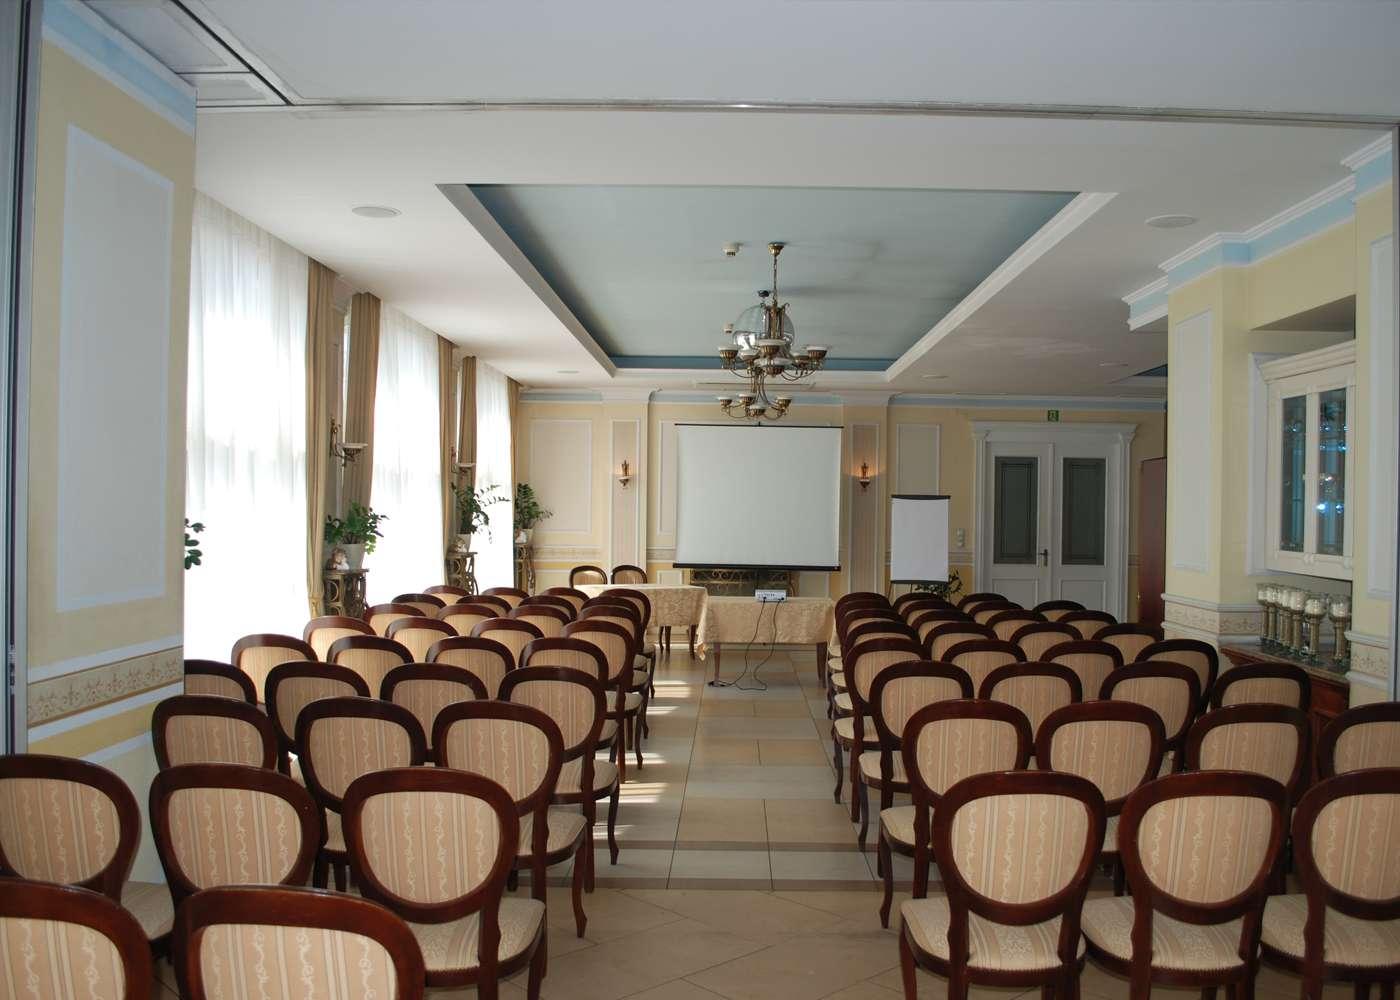 sale konferencyjne vilal royal zdjęcie 3